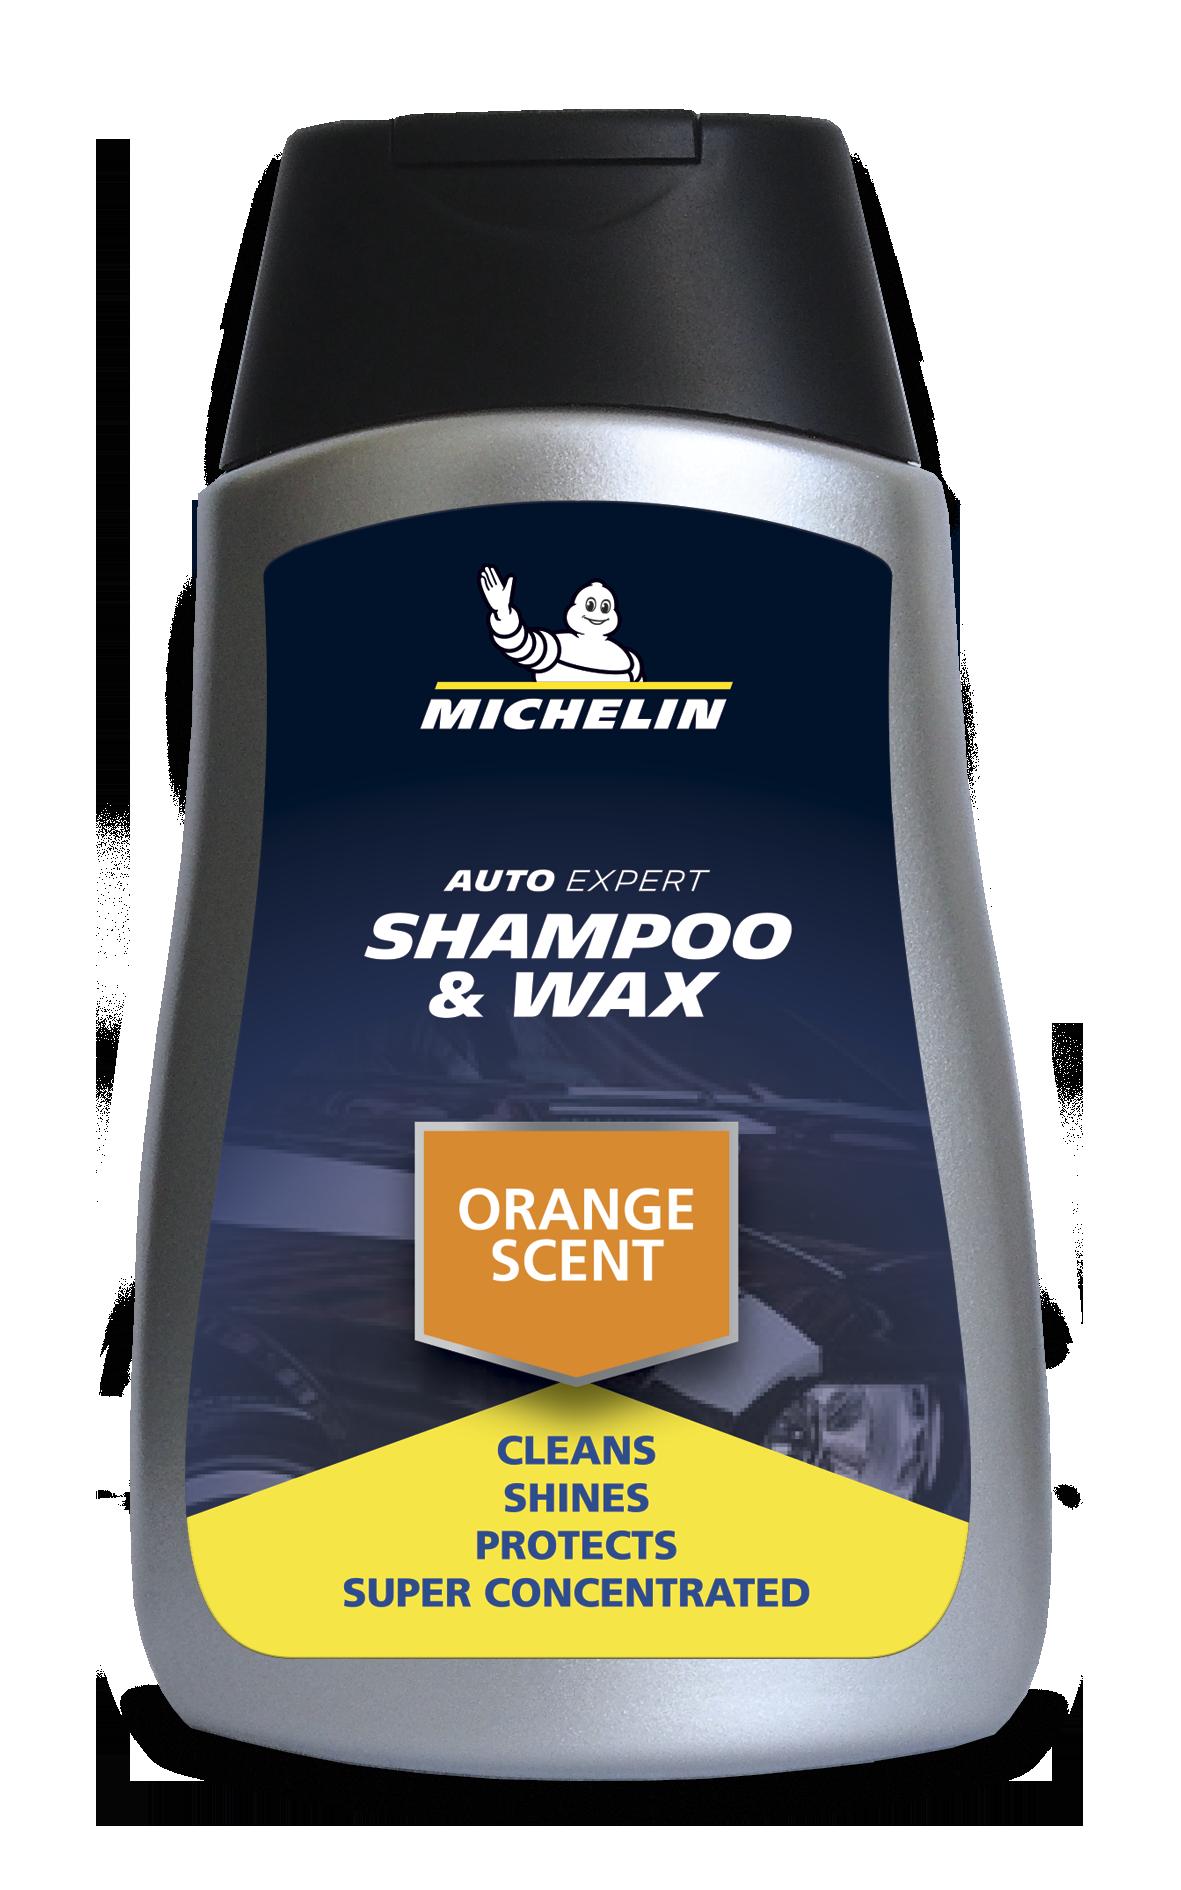 Michelin - Shampoo And Wax 250ml